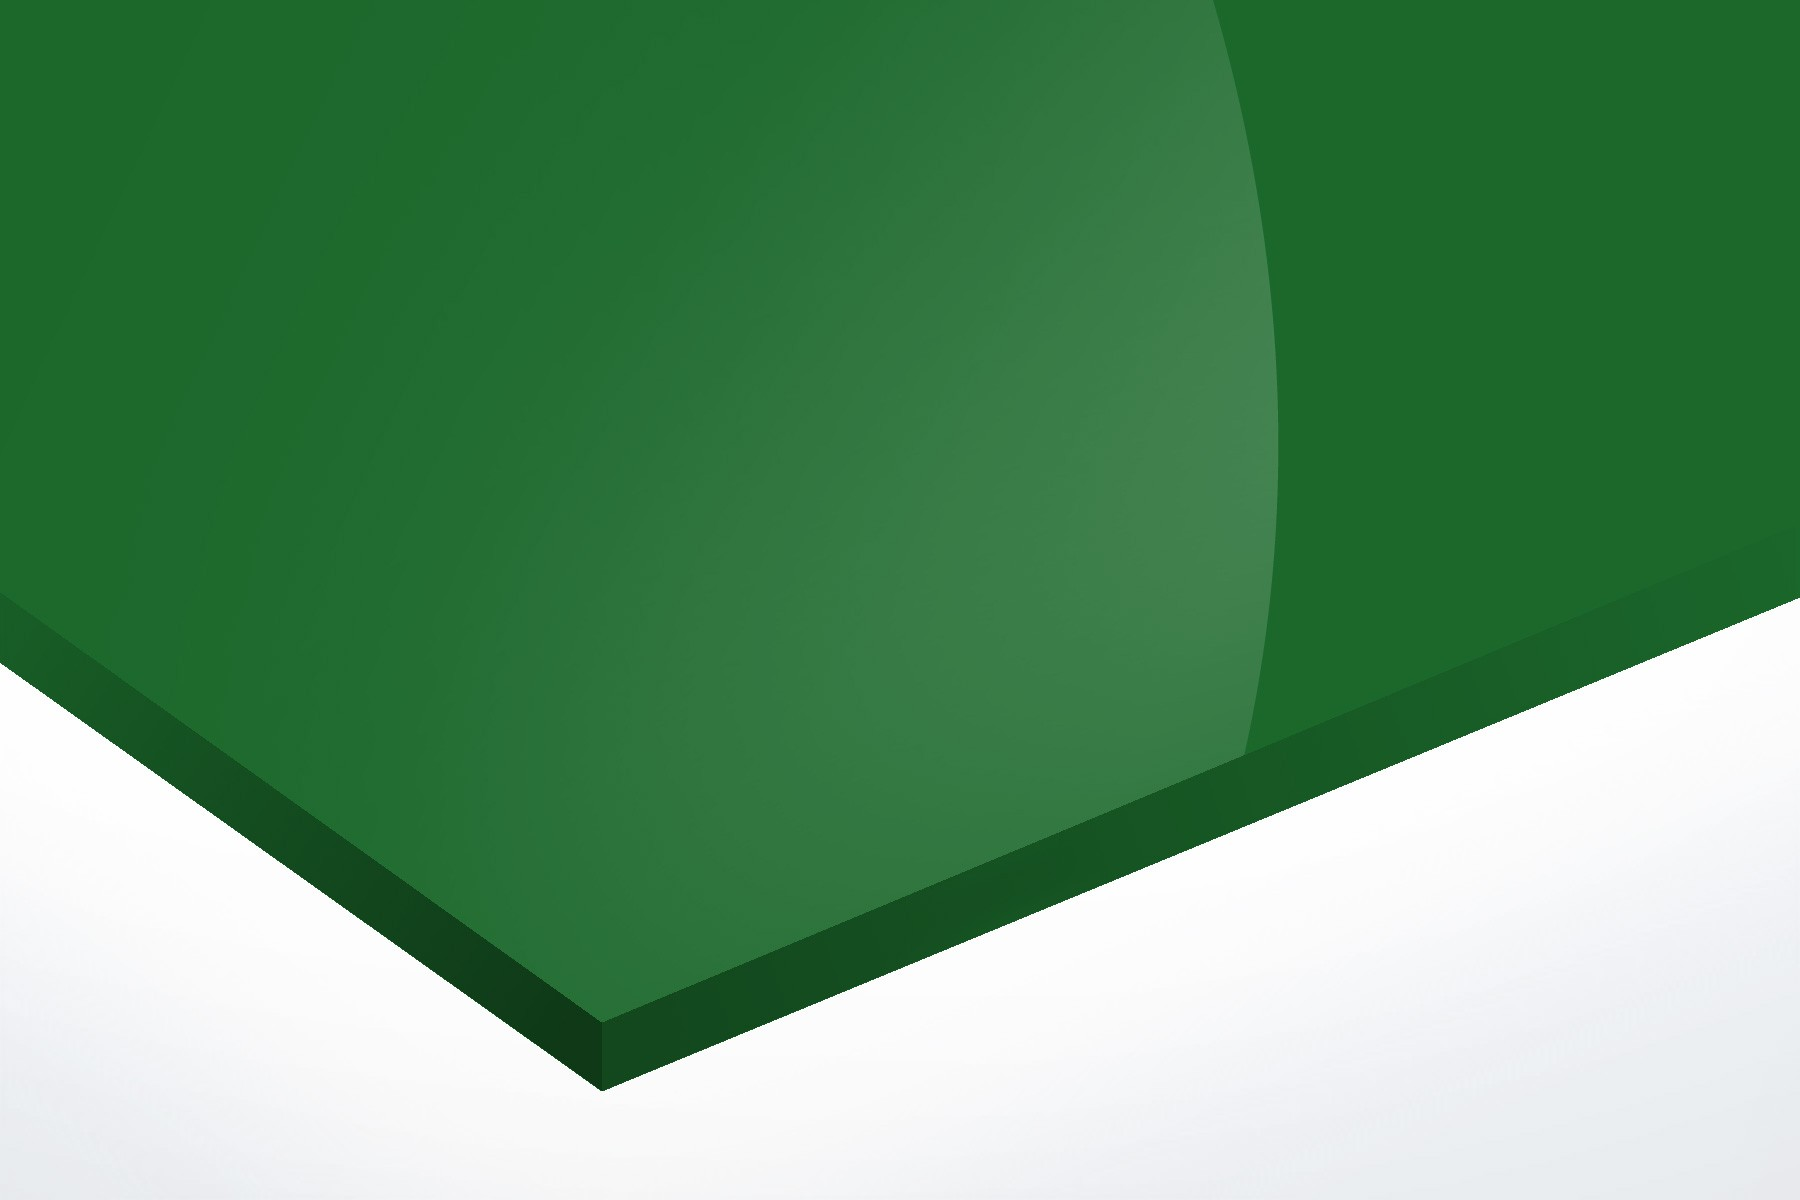 Anodised Aluminium Green, Gloss 1mm x 1000mm x 500mm